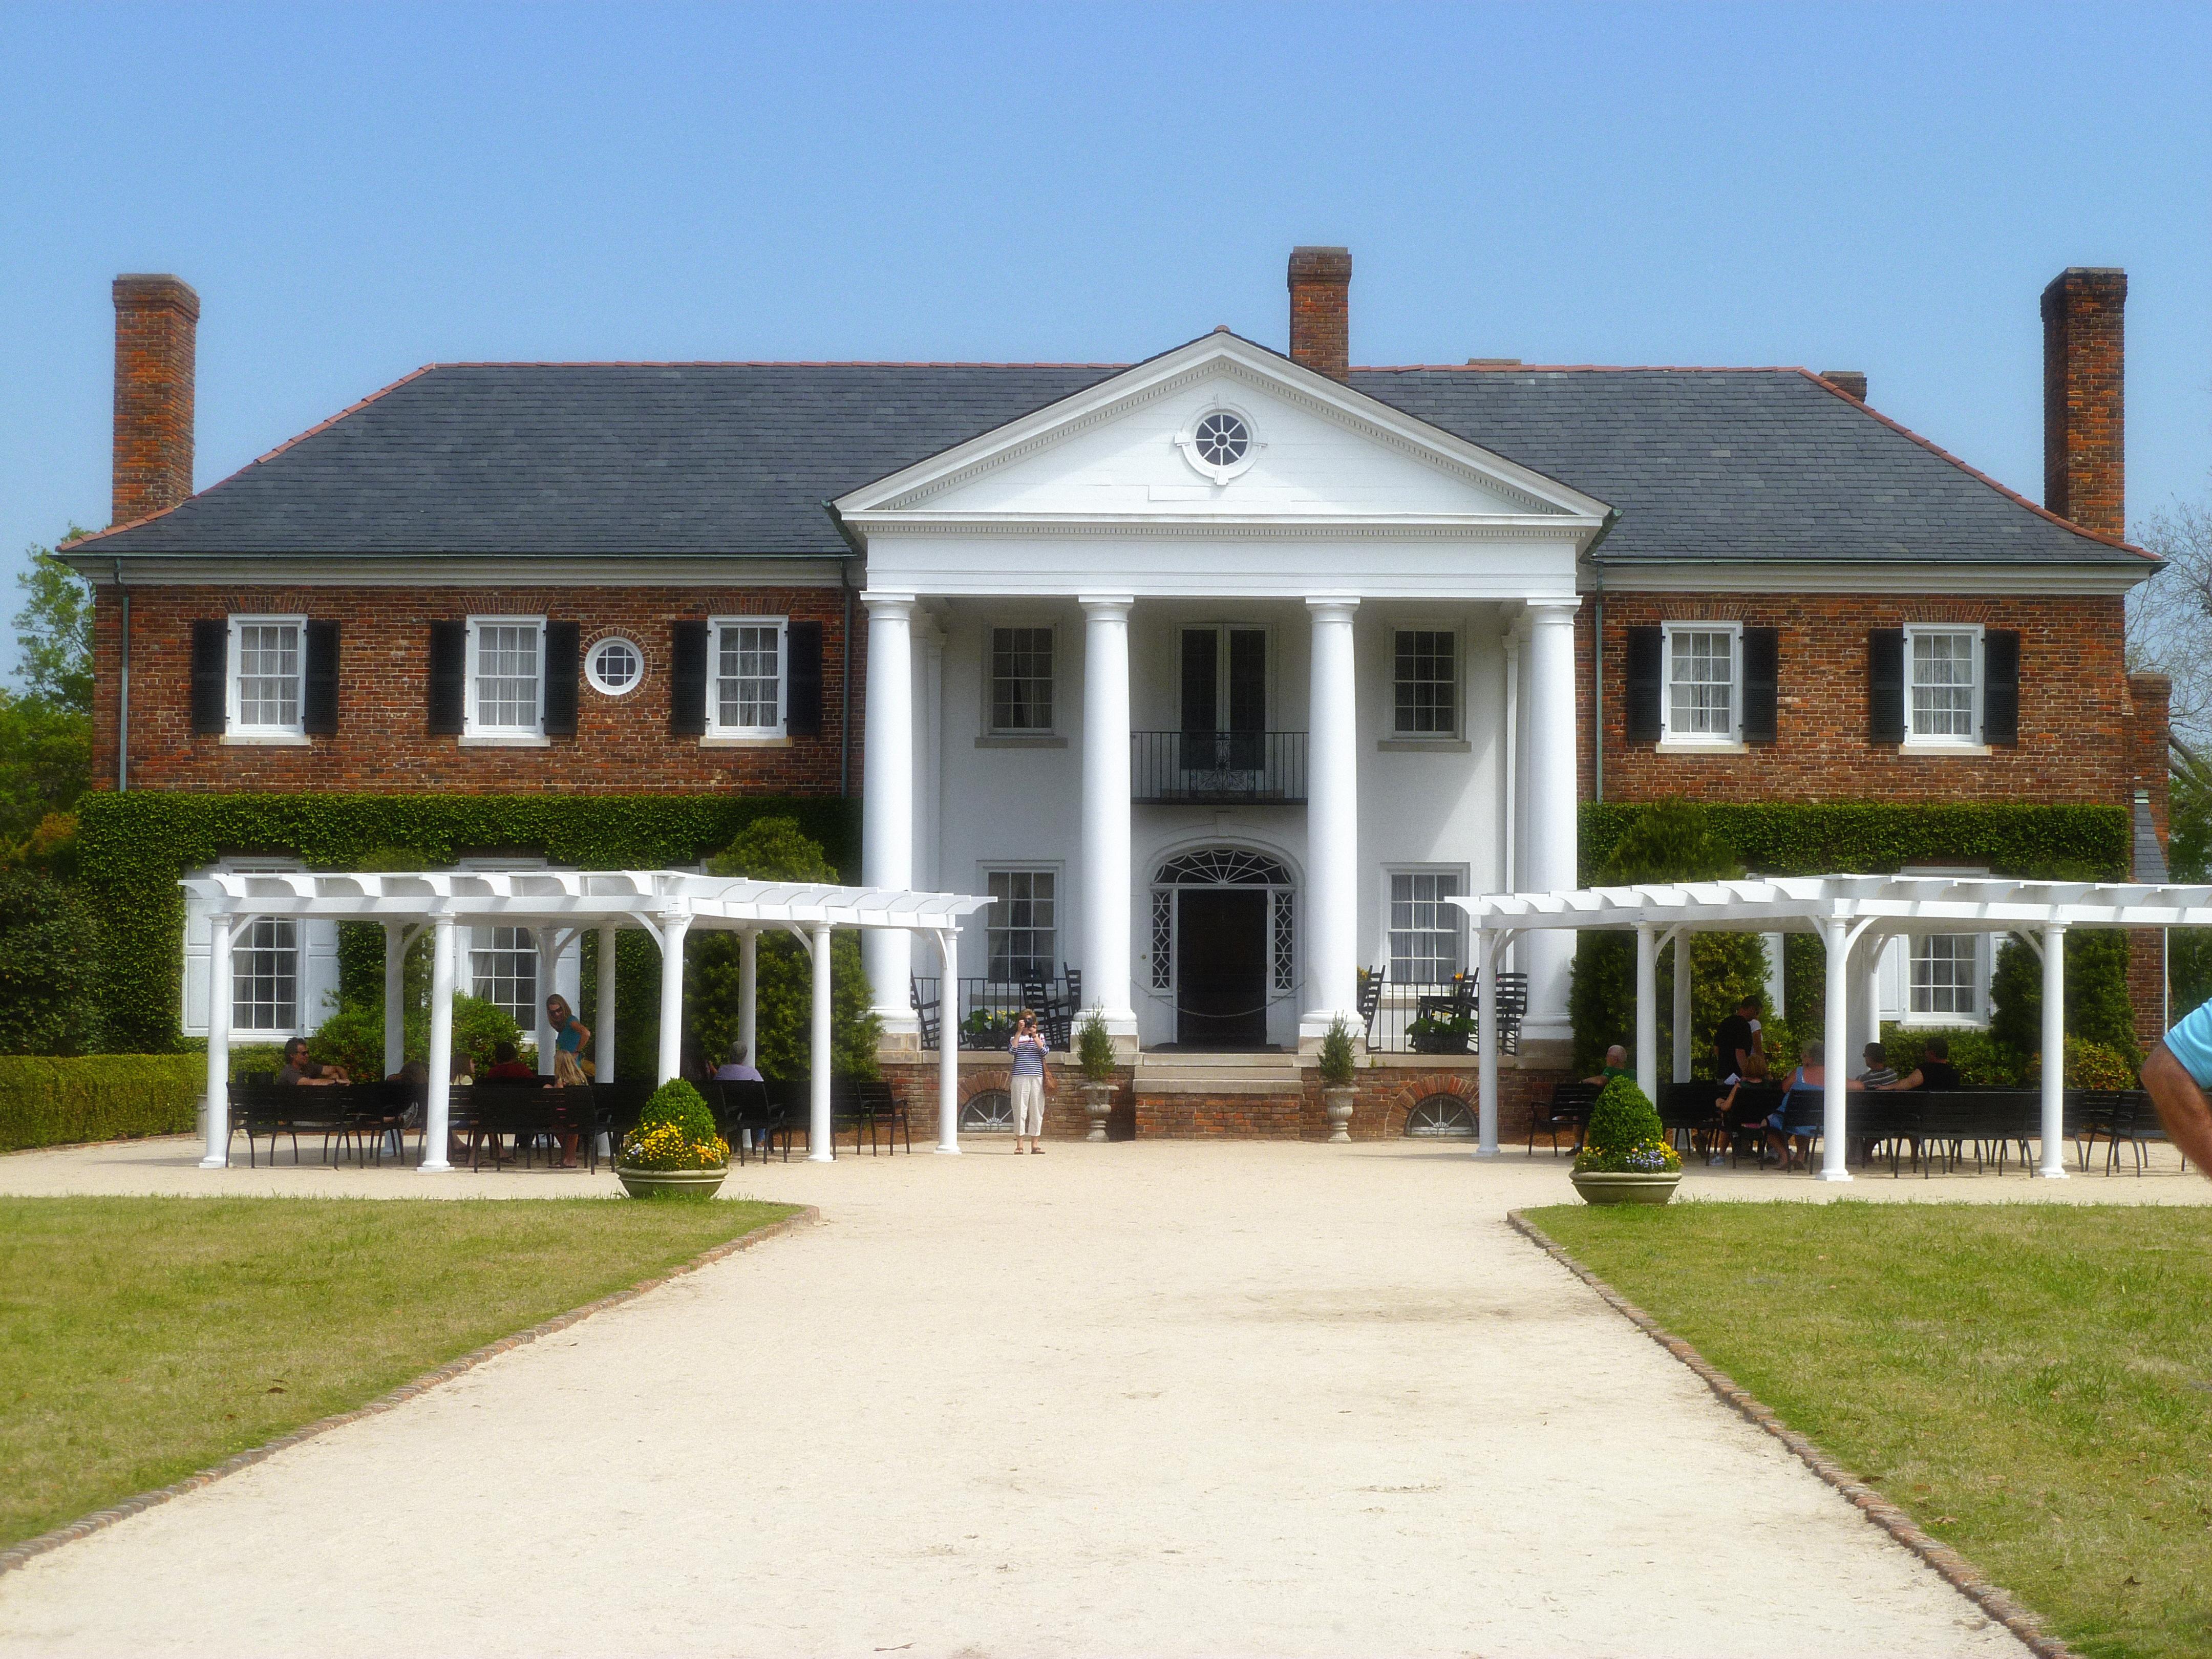 Boone Hall - Wikipedia on georgian colonial house plans, traditional georgian house plans, english georgian house plans, old plantation style house plans, french colonial home plans, georgian style homes,